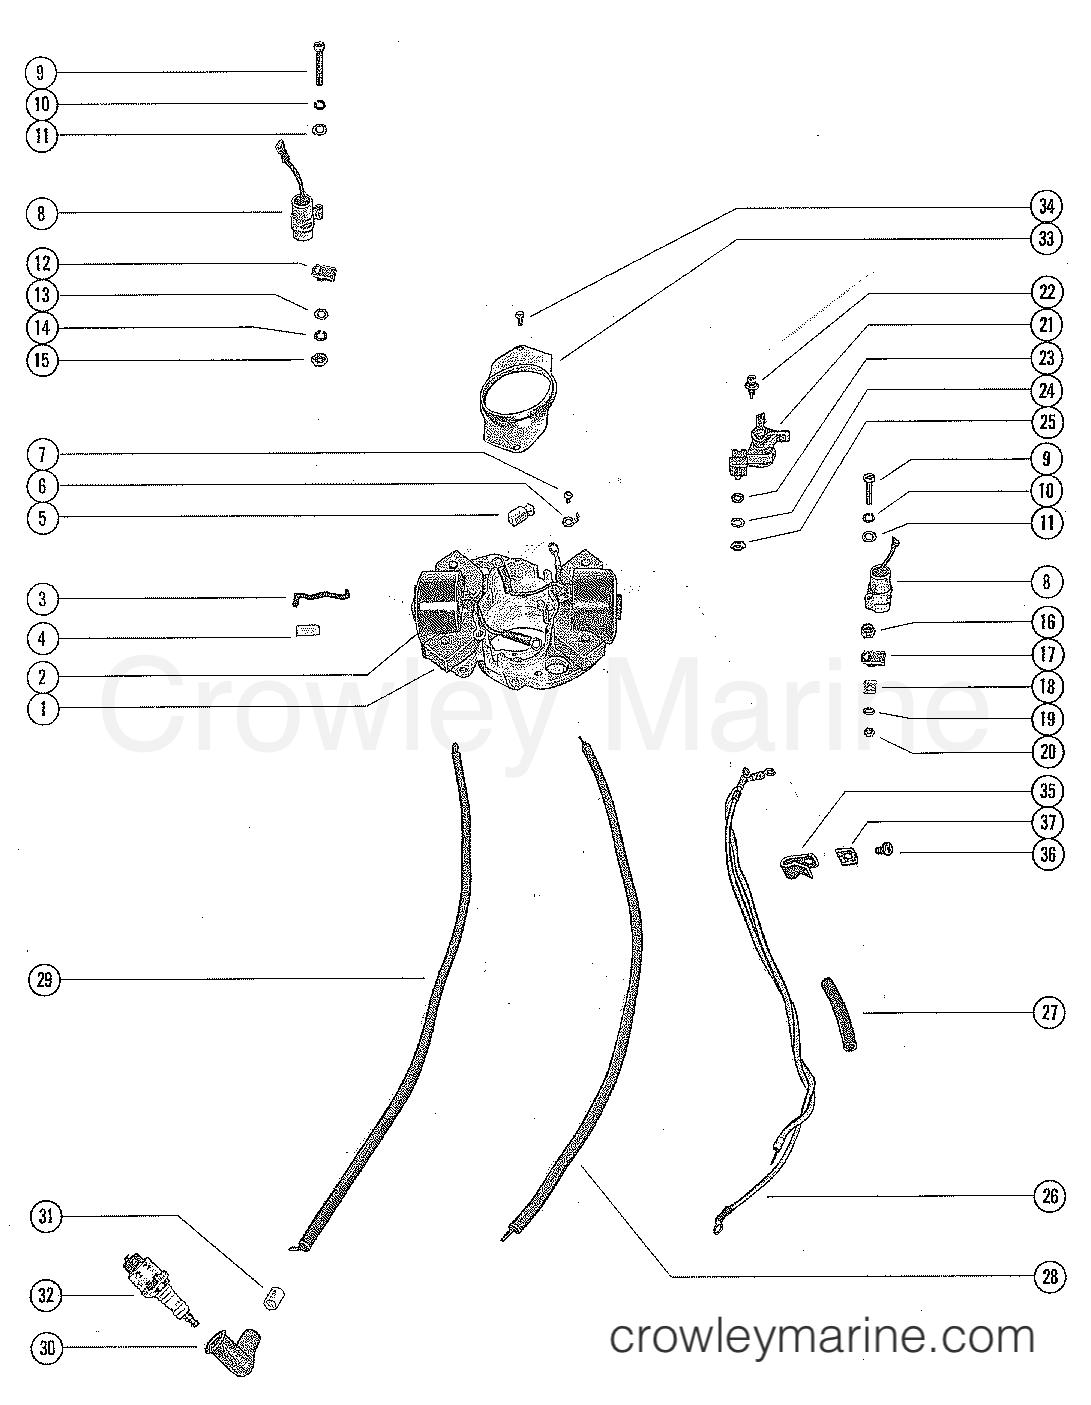 Stator Plate Assembly